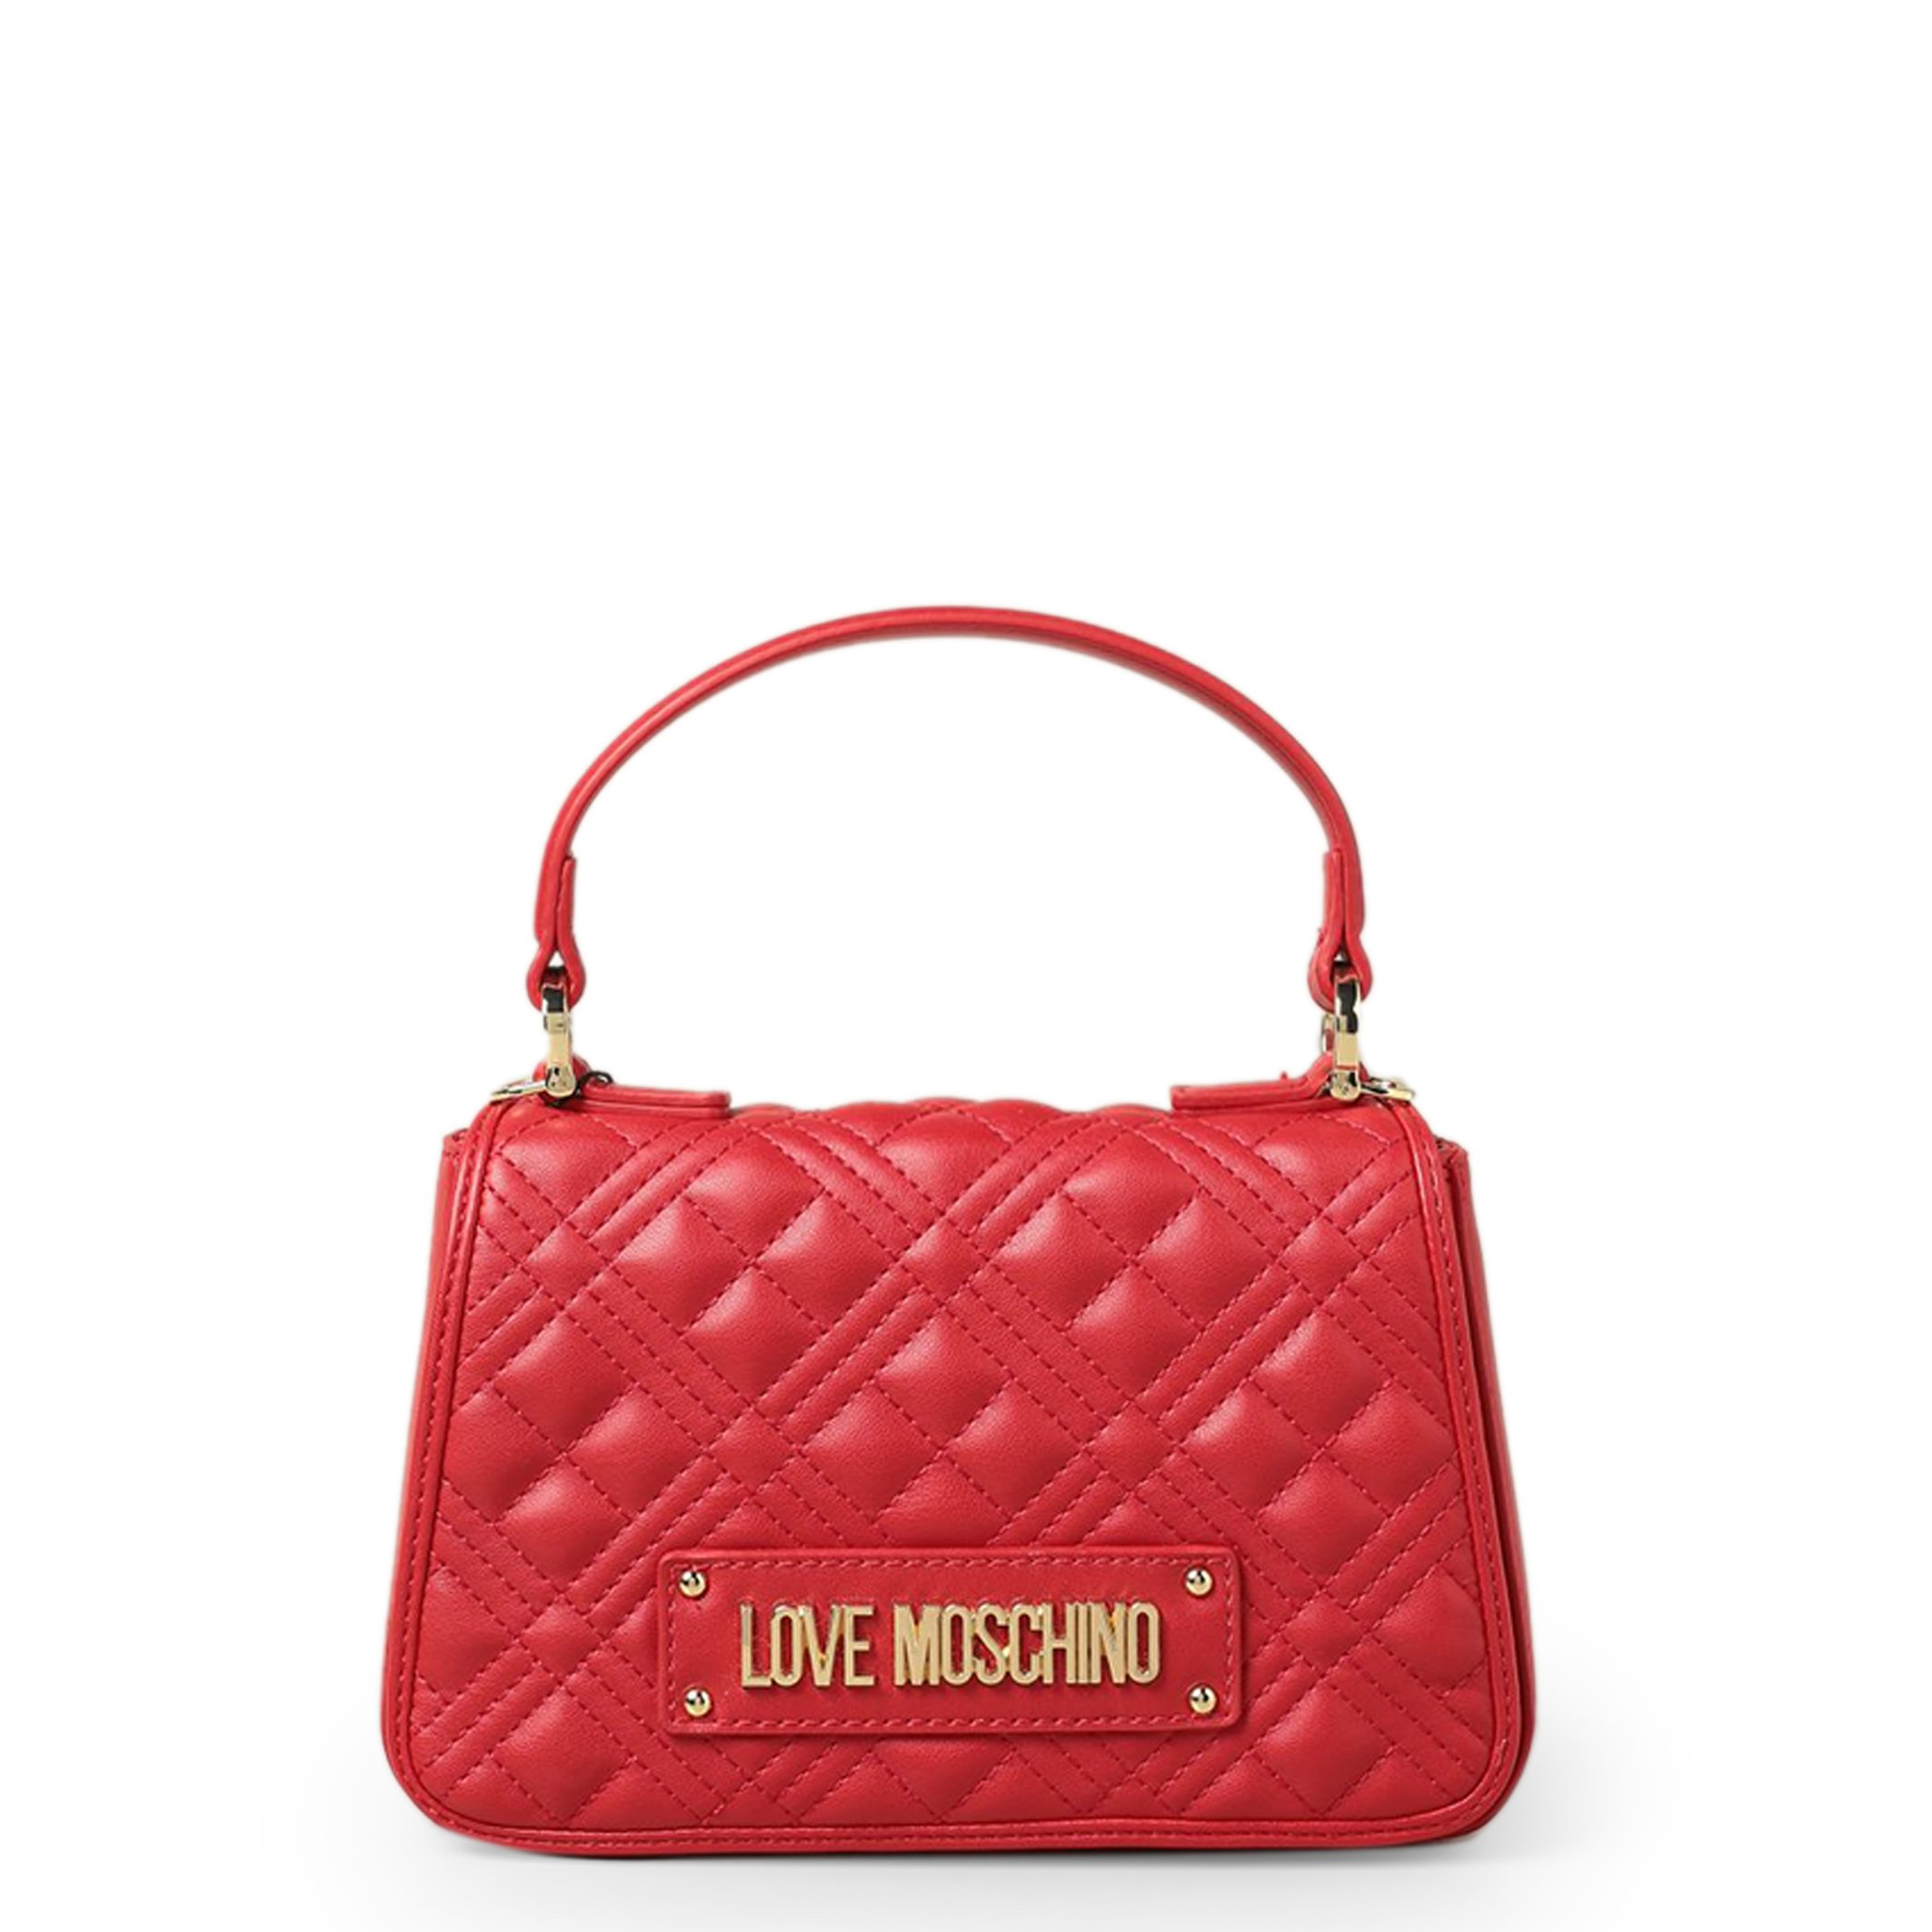 Love Moschino Women's Handbag Various Colours JC4202PP0CKA0 - red NOSIZE